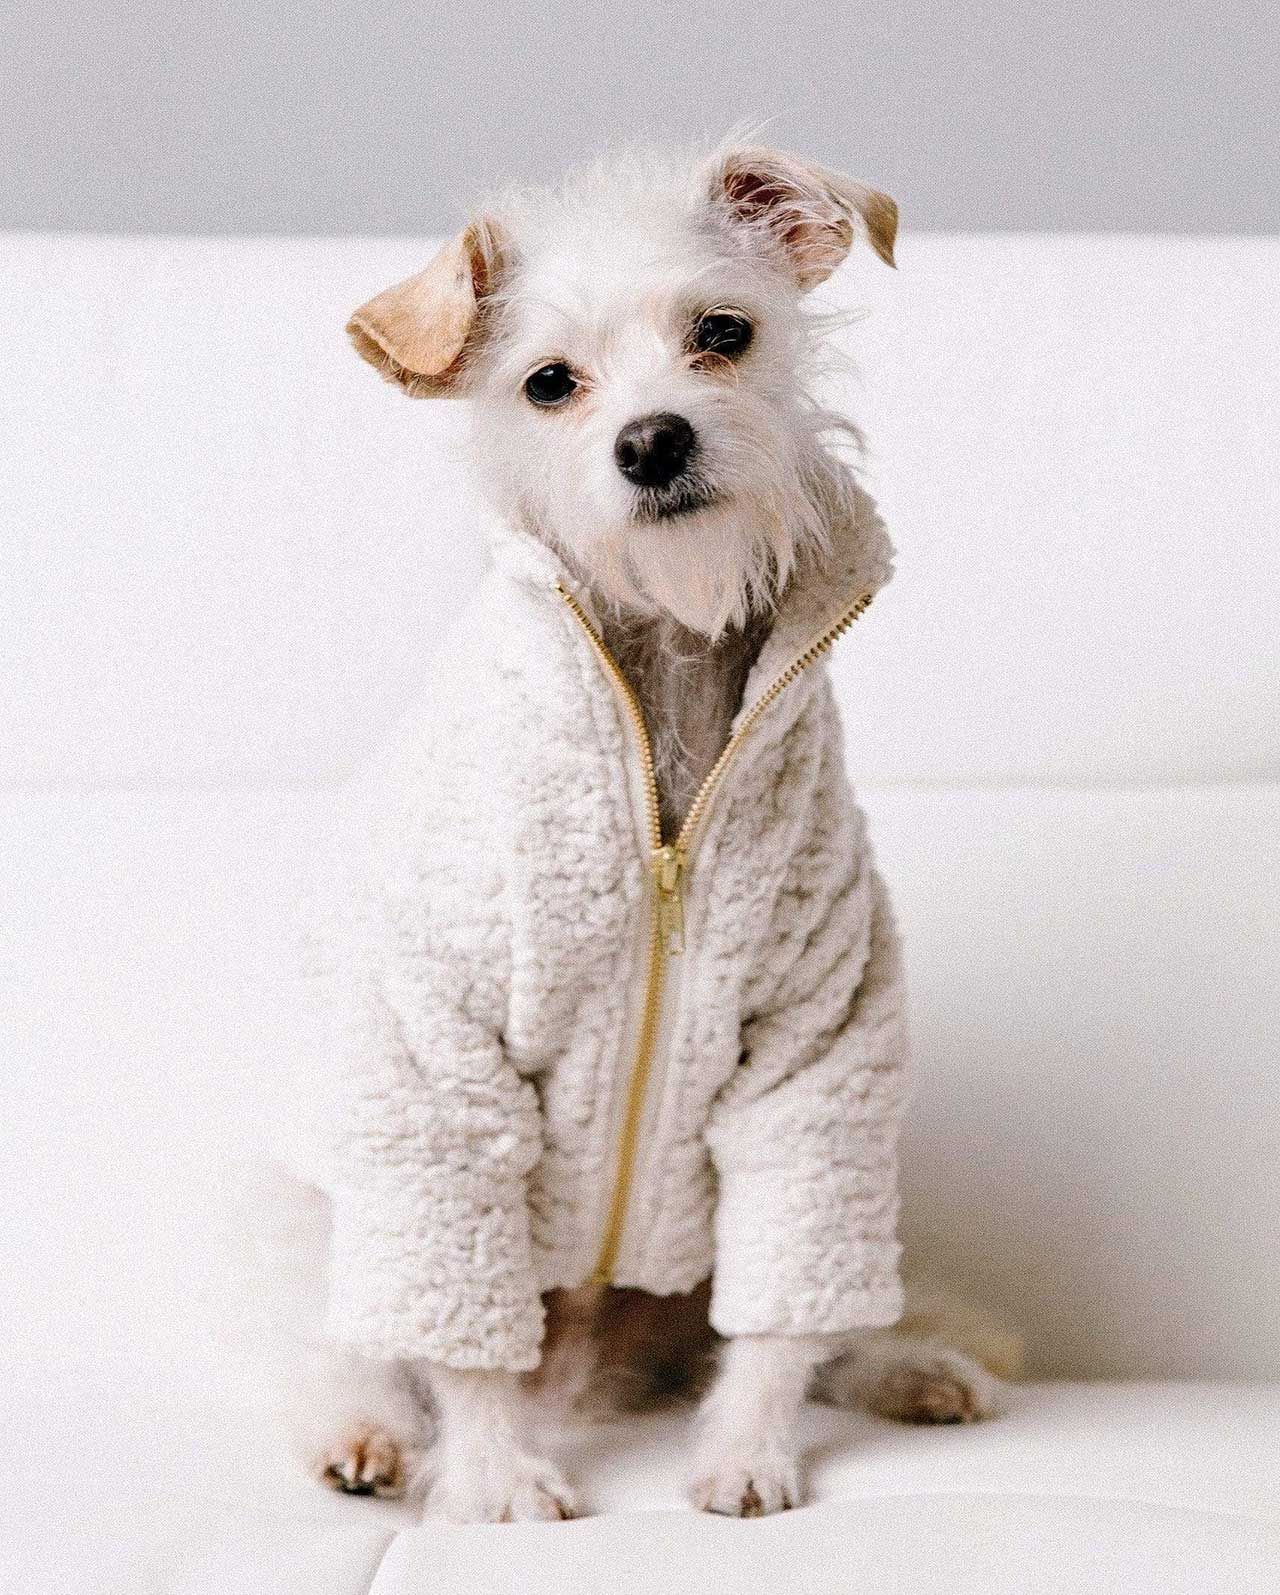 7 Modern Dog Outerwear Options To Keep Them Warm Design Milk In 2021 Dog Clothes Dog Jacket Modern Dog [ 1595 x 1280 Pixel ]